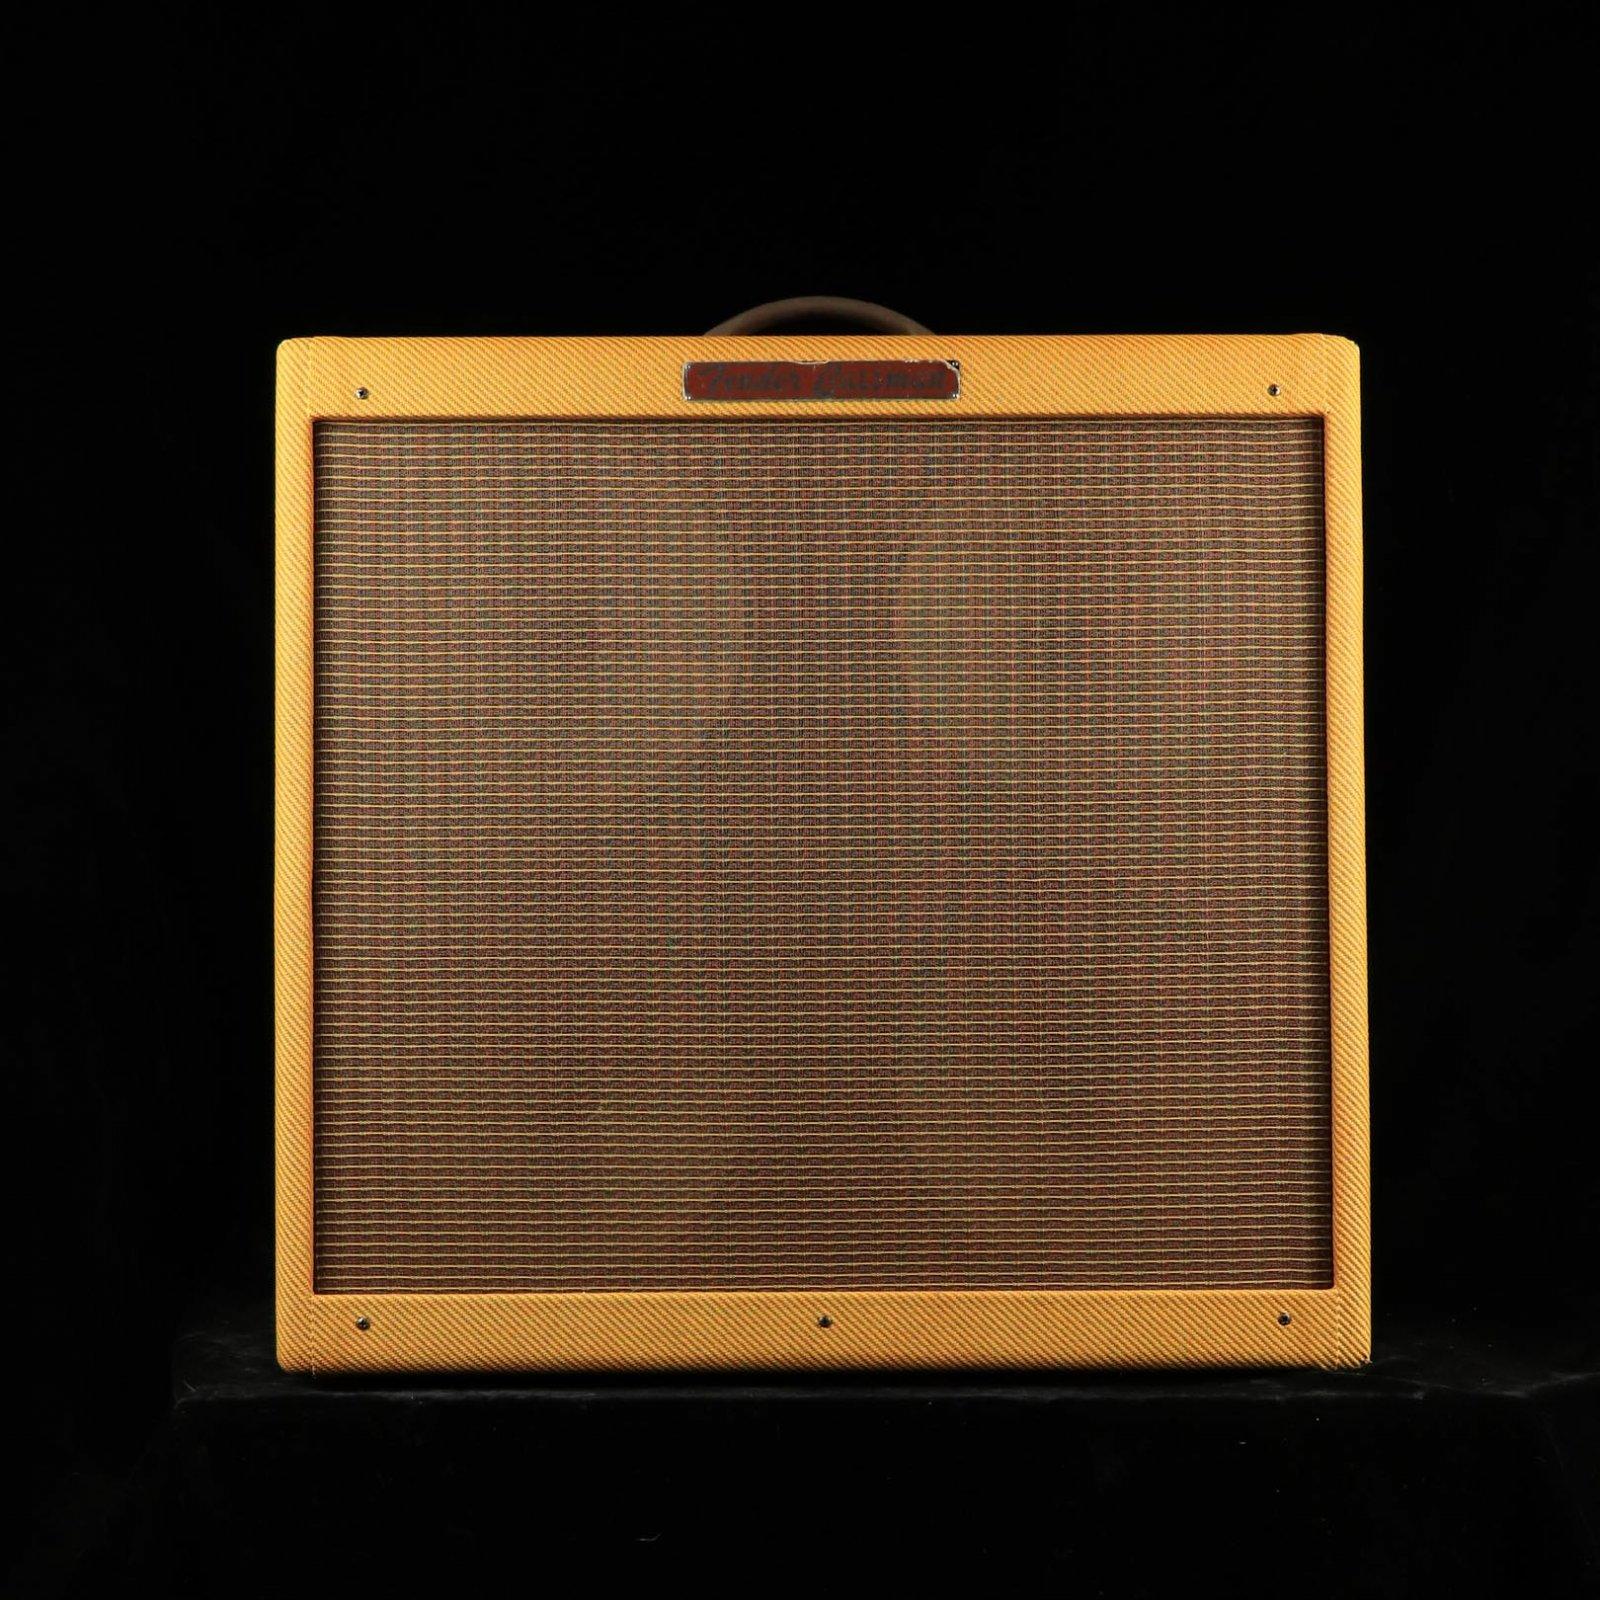 Fender '59 Bassman LTD